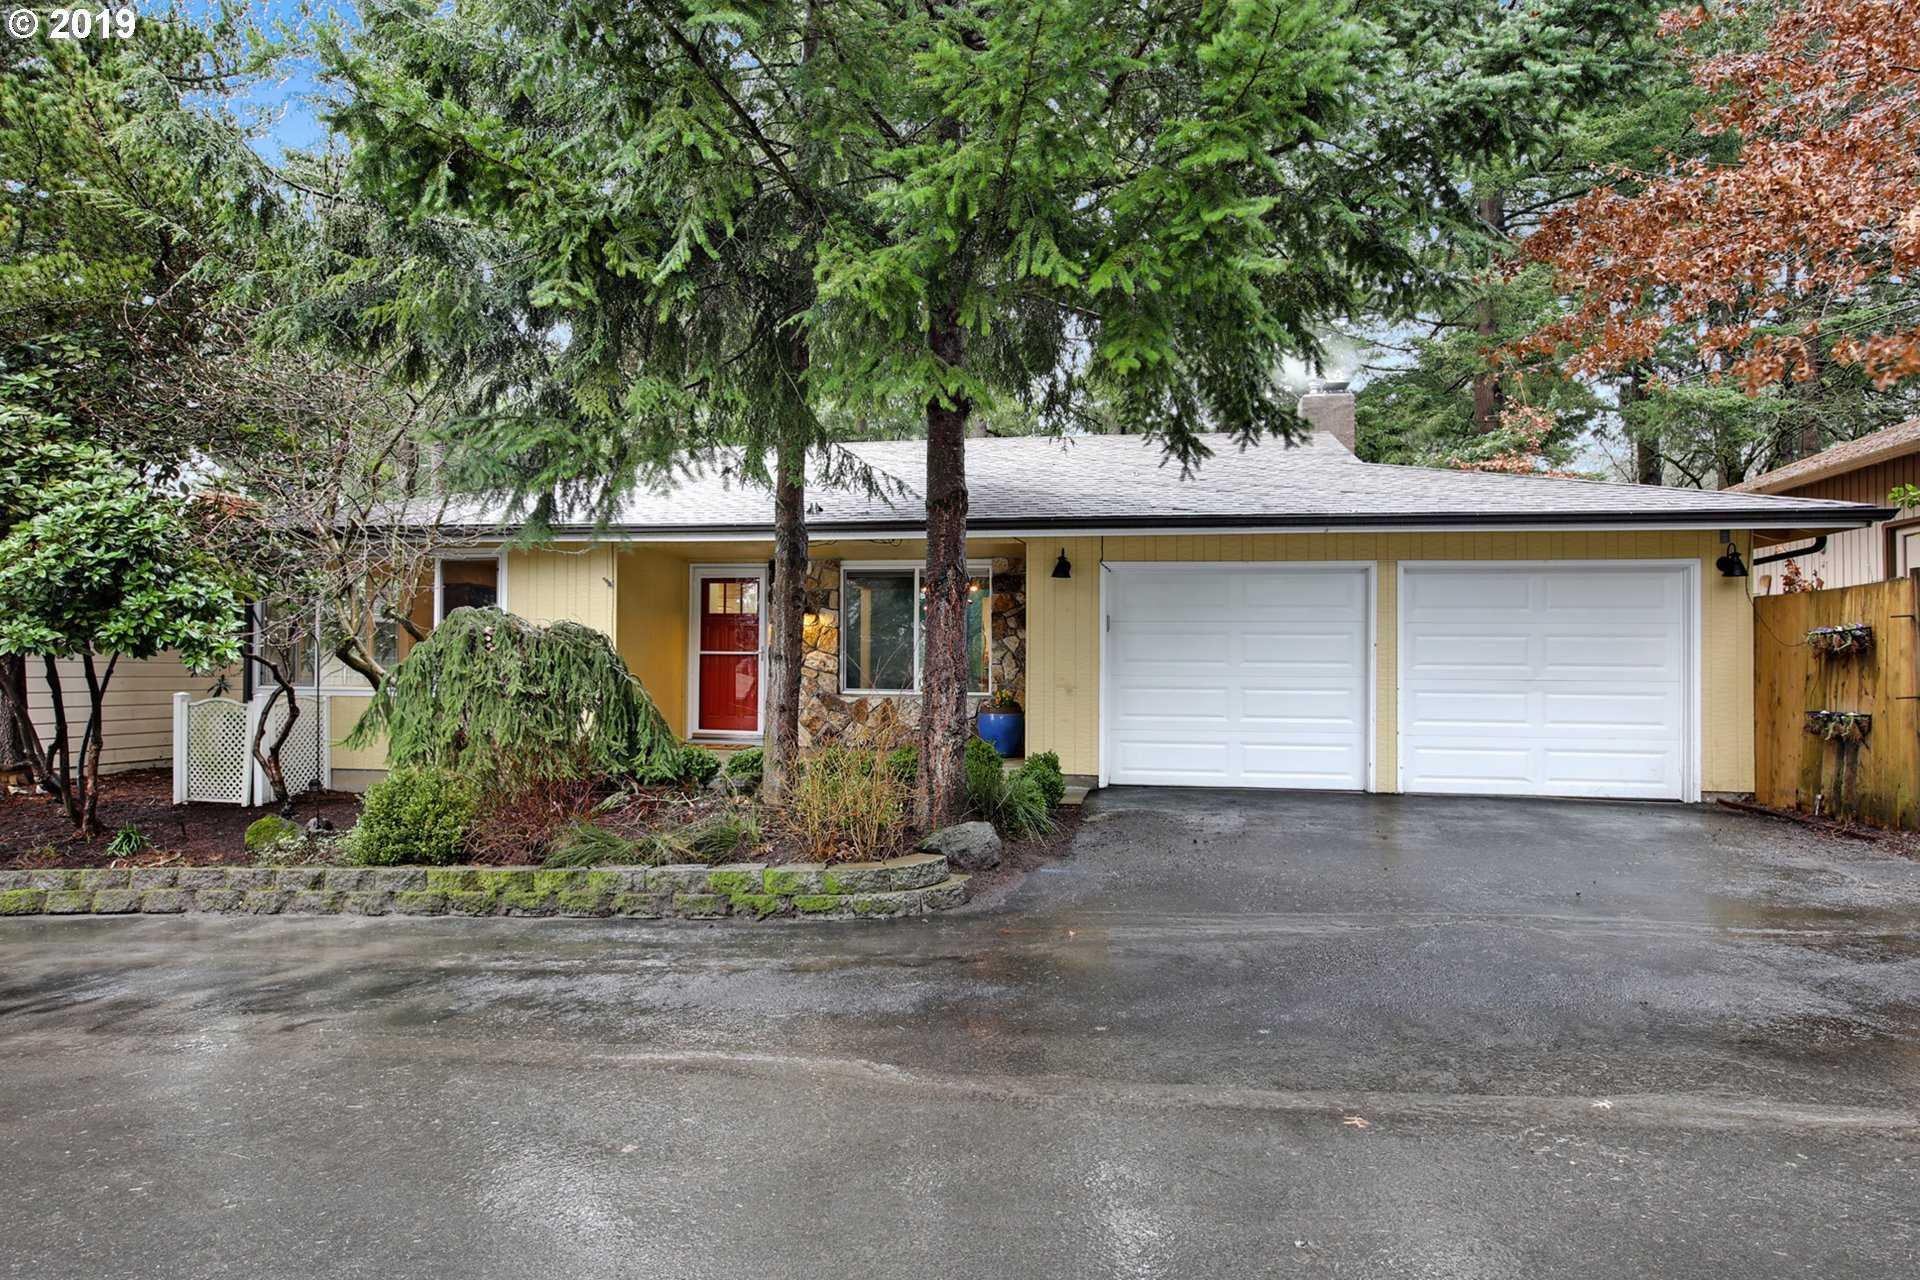 $419,900 - 3Br/2Ba -  for Sale in Hyland Hills, Beaverton